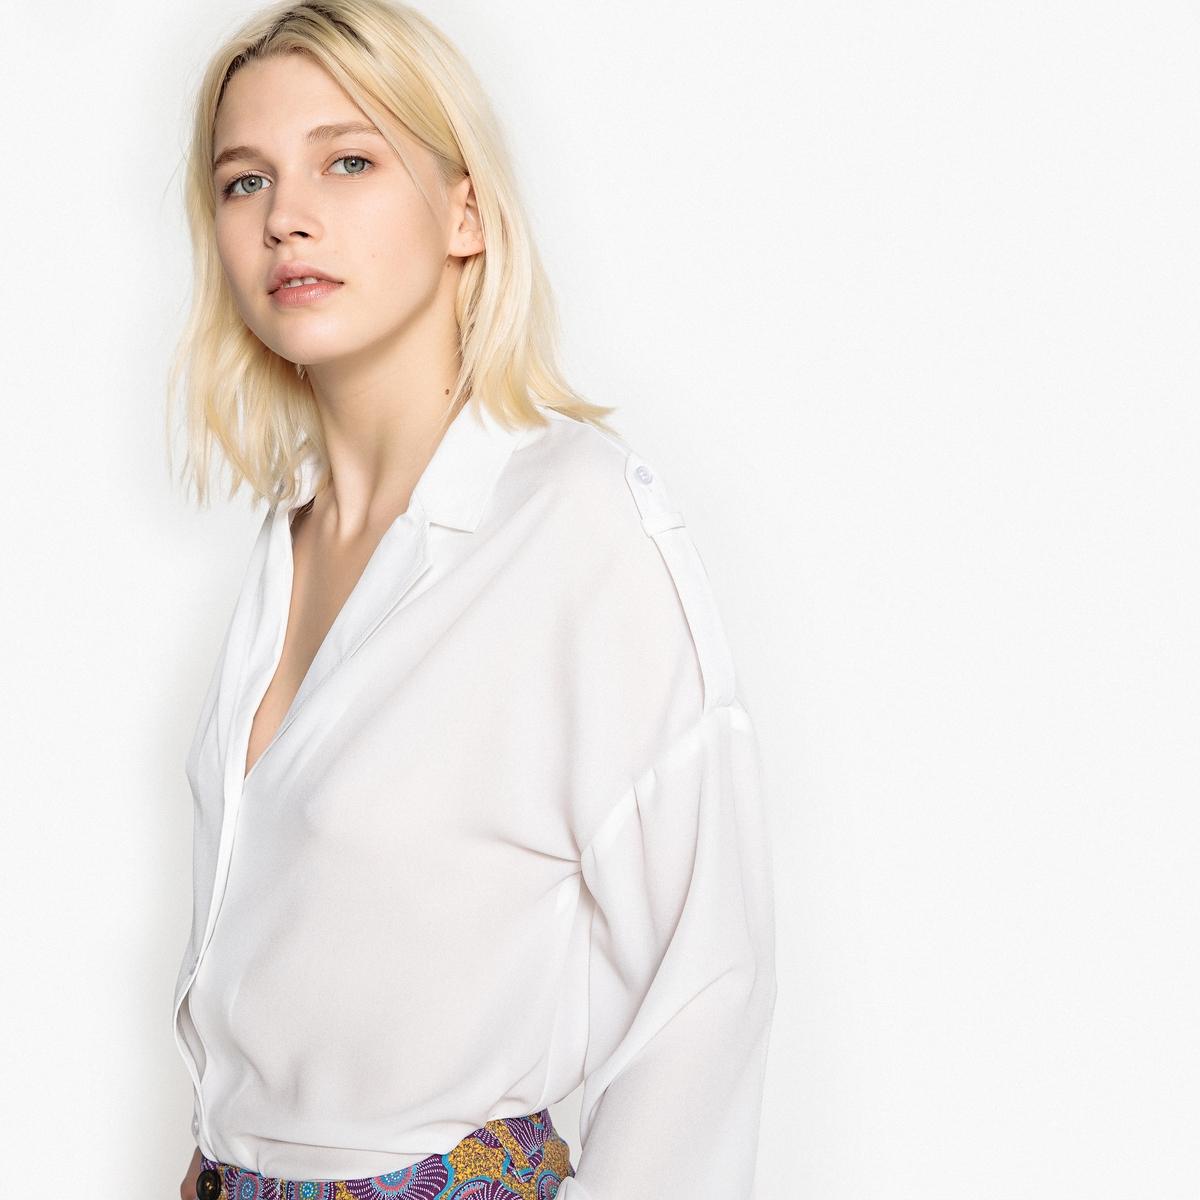 Camisa lisa de manga larga, cuello sastre